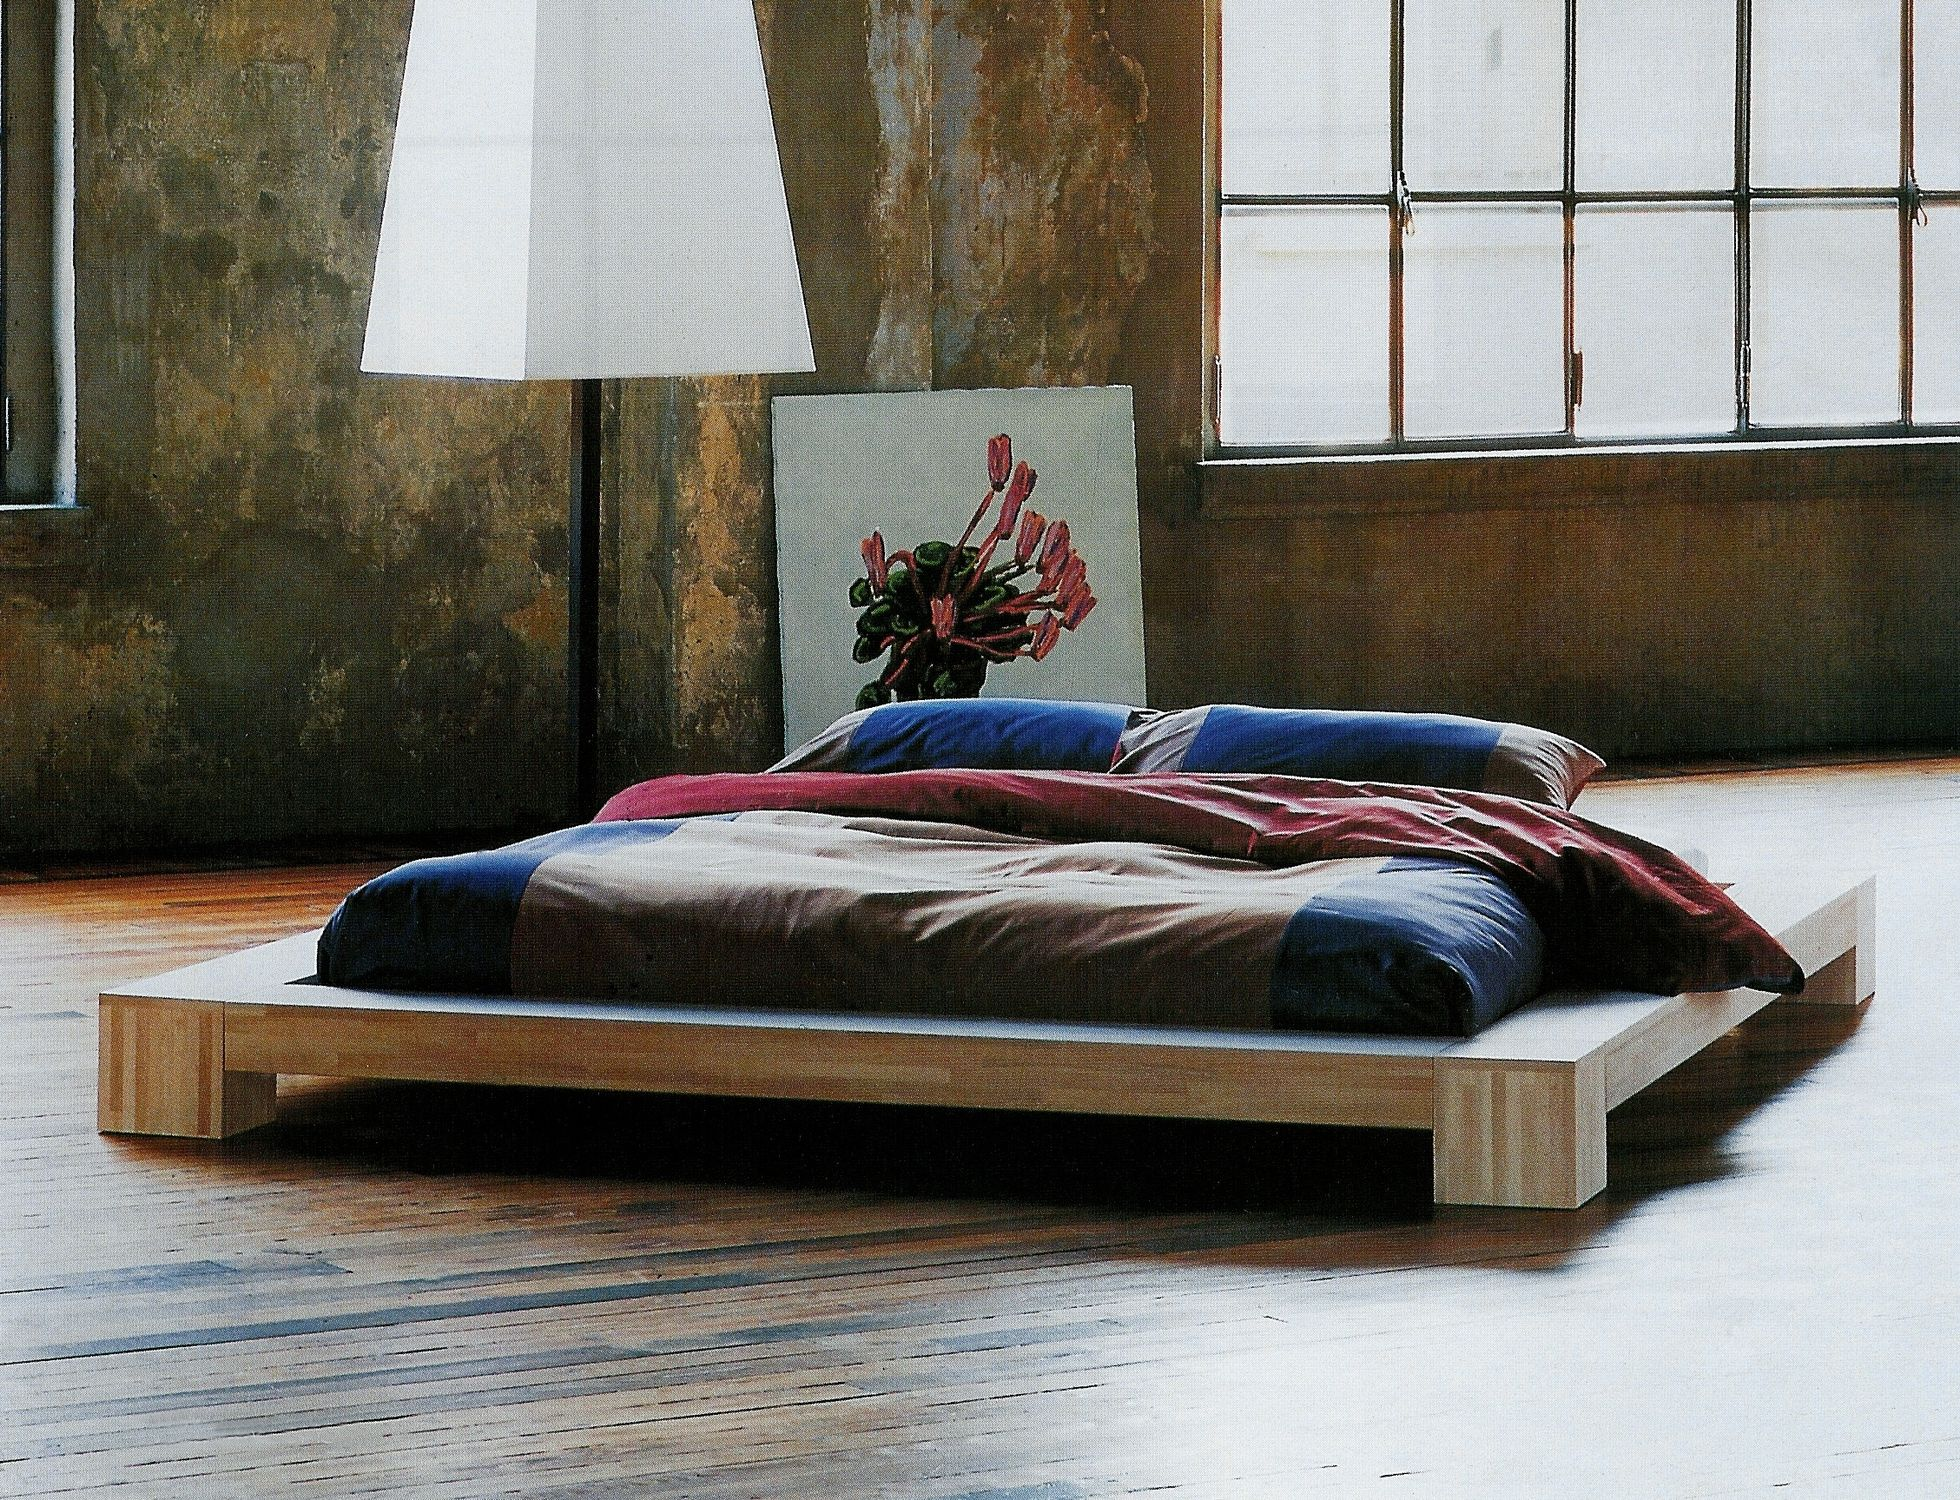 Full Size of Tatami Bett Doppelbett Modern Holz Isola Cinius Betten 140x200 180x200 Schwarz Hamburg Graues Ebay Sitzbank 200x200 Stauraum 160x200 Mit Lattenrost Und Bett Tatami Bett